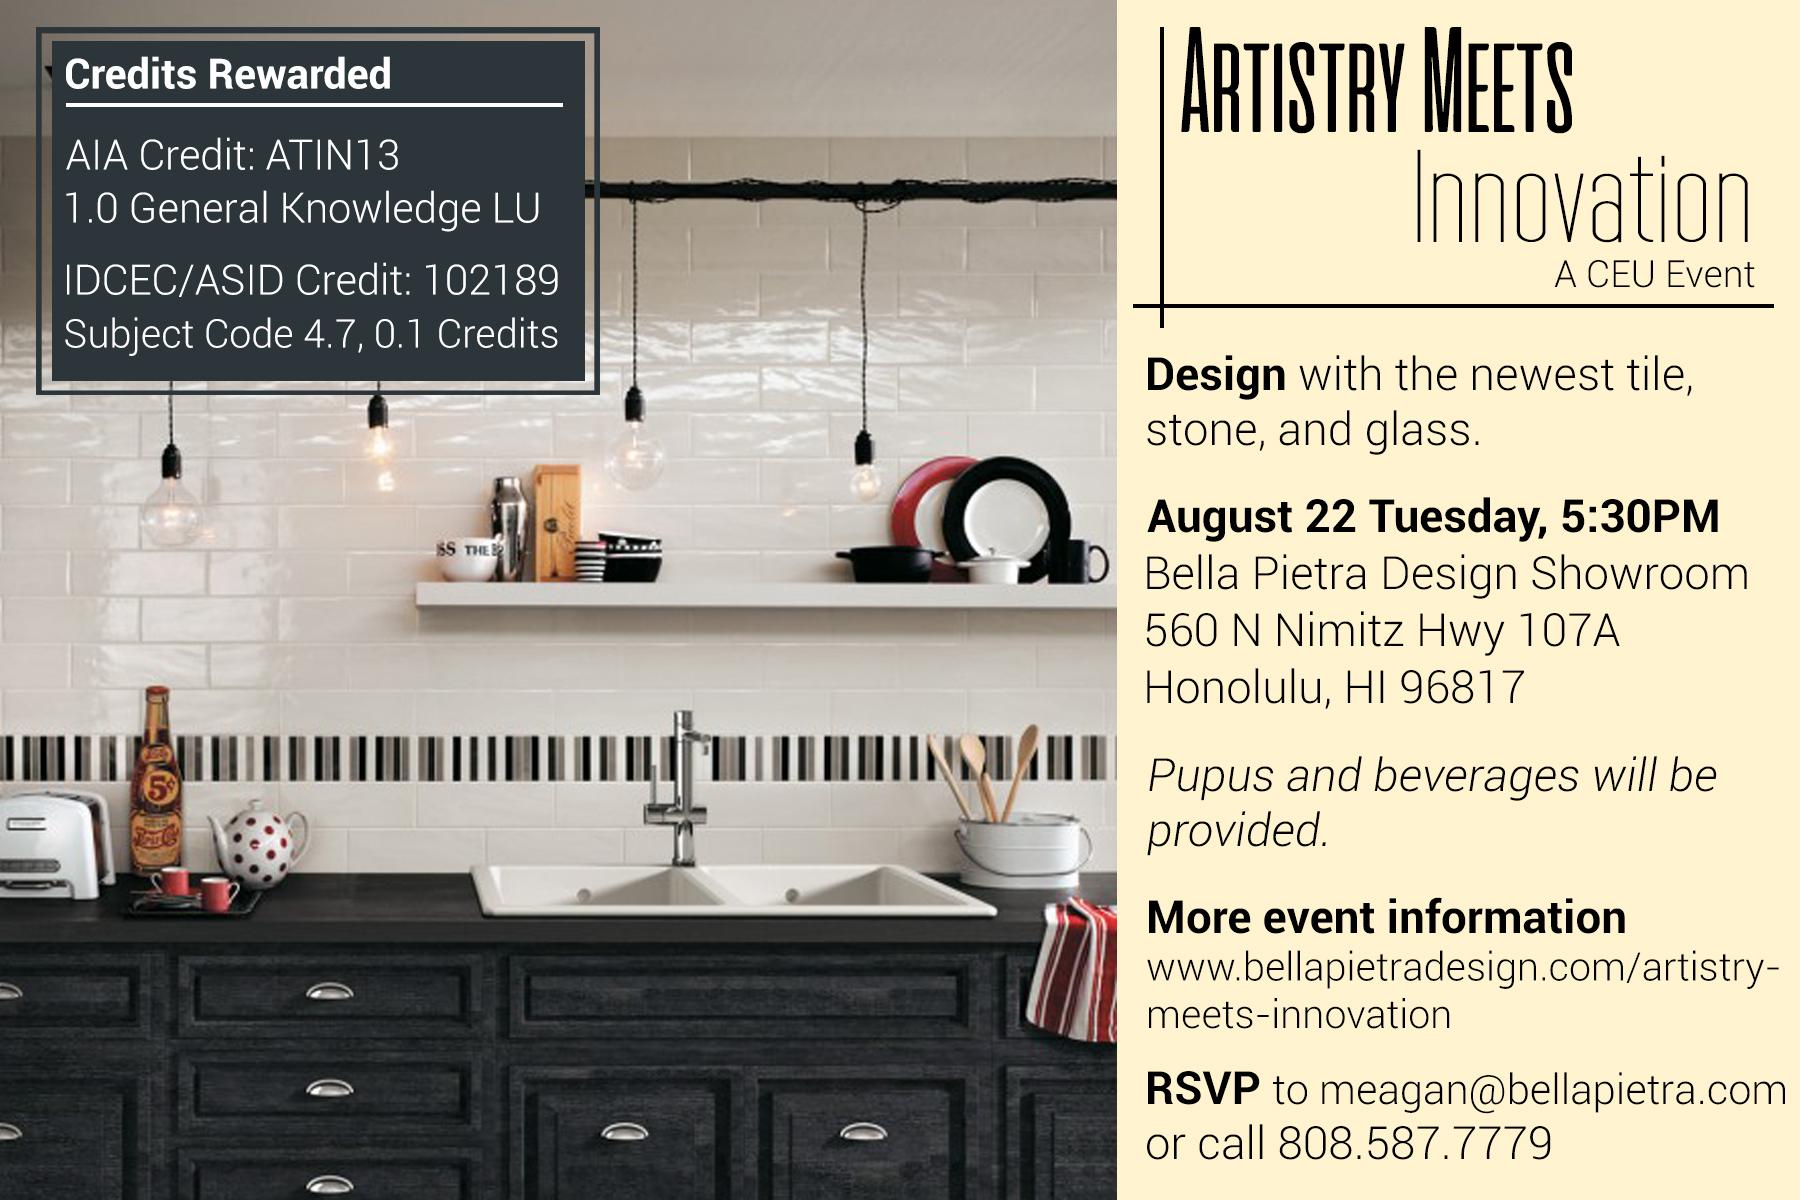 CEU Event Artistry Meets Innovation